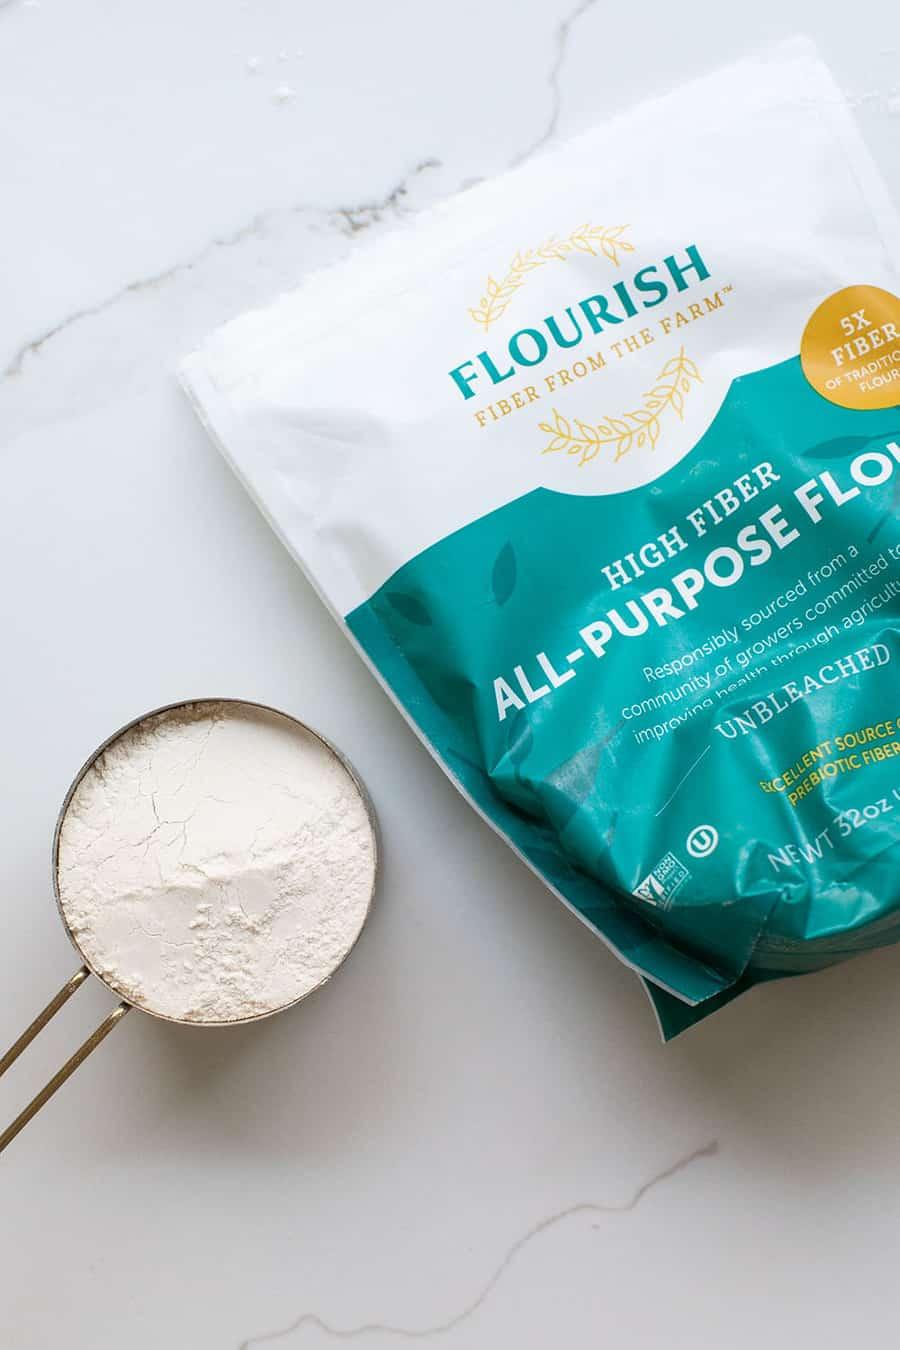 Flourish Flour an all-purpose high fiber flour for baking